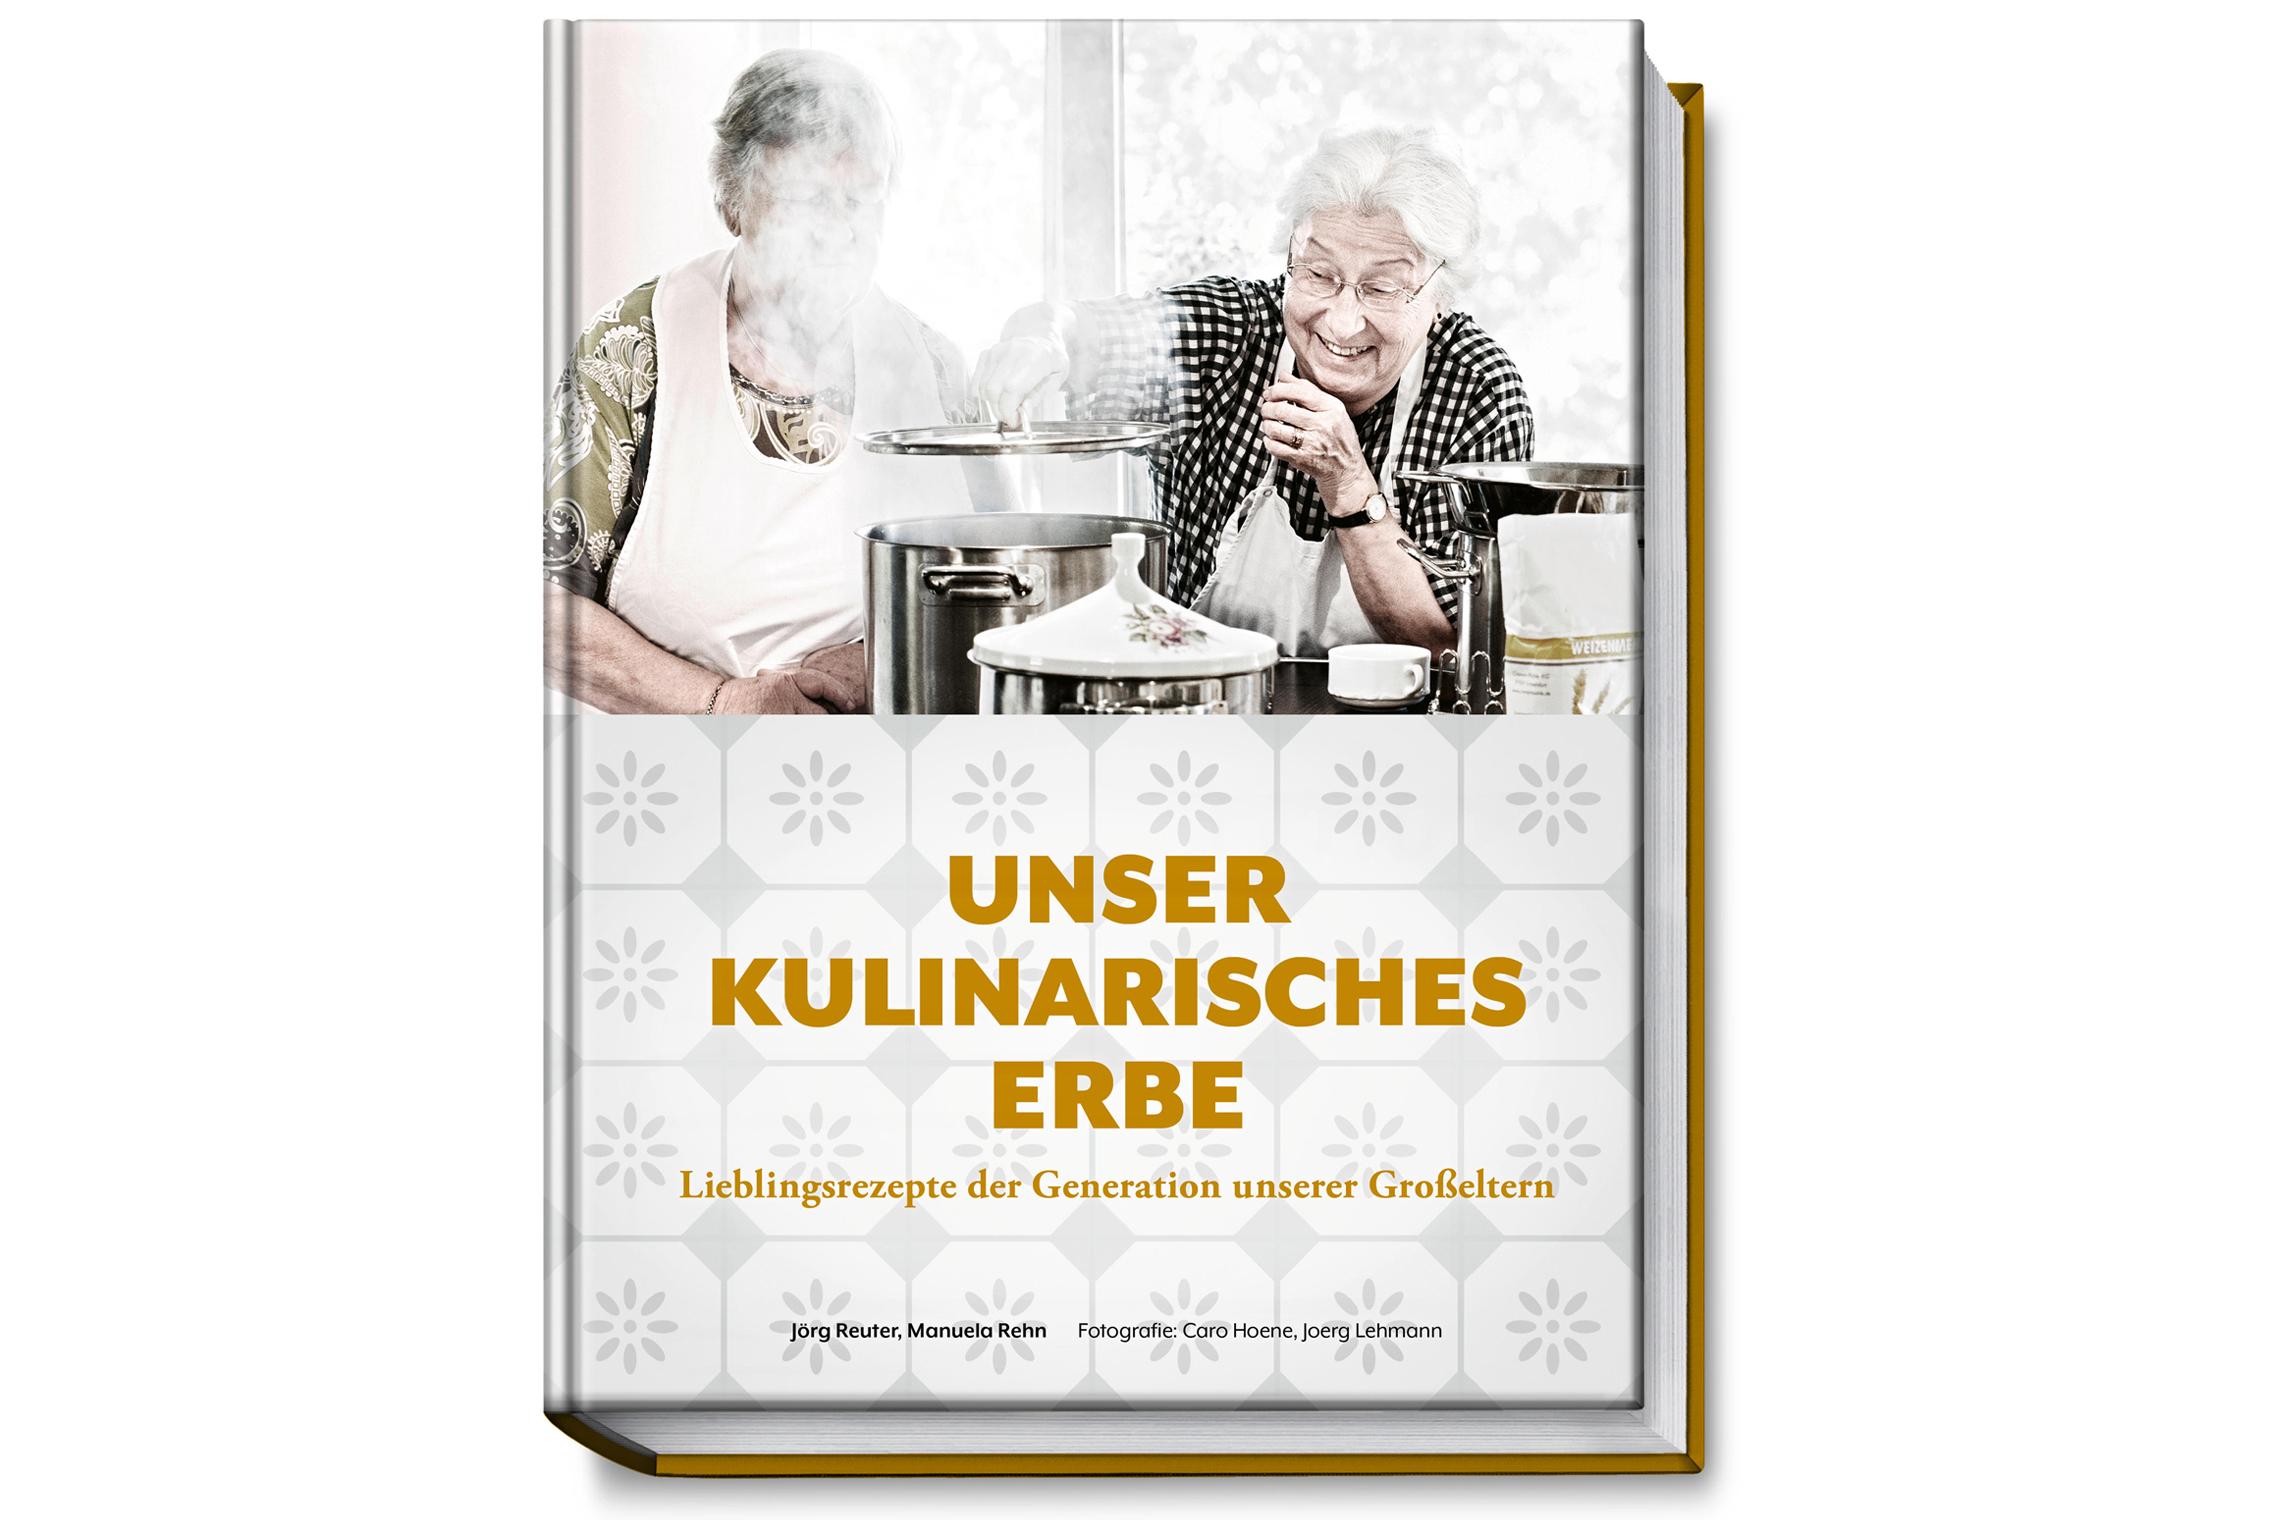 Kochbuch Portraitfotografin Fotodokumentation Fotoprojekt Buchprojekt Buchveröffentlichung Caro Hoene Photography Berlin